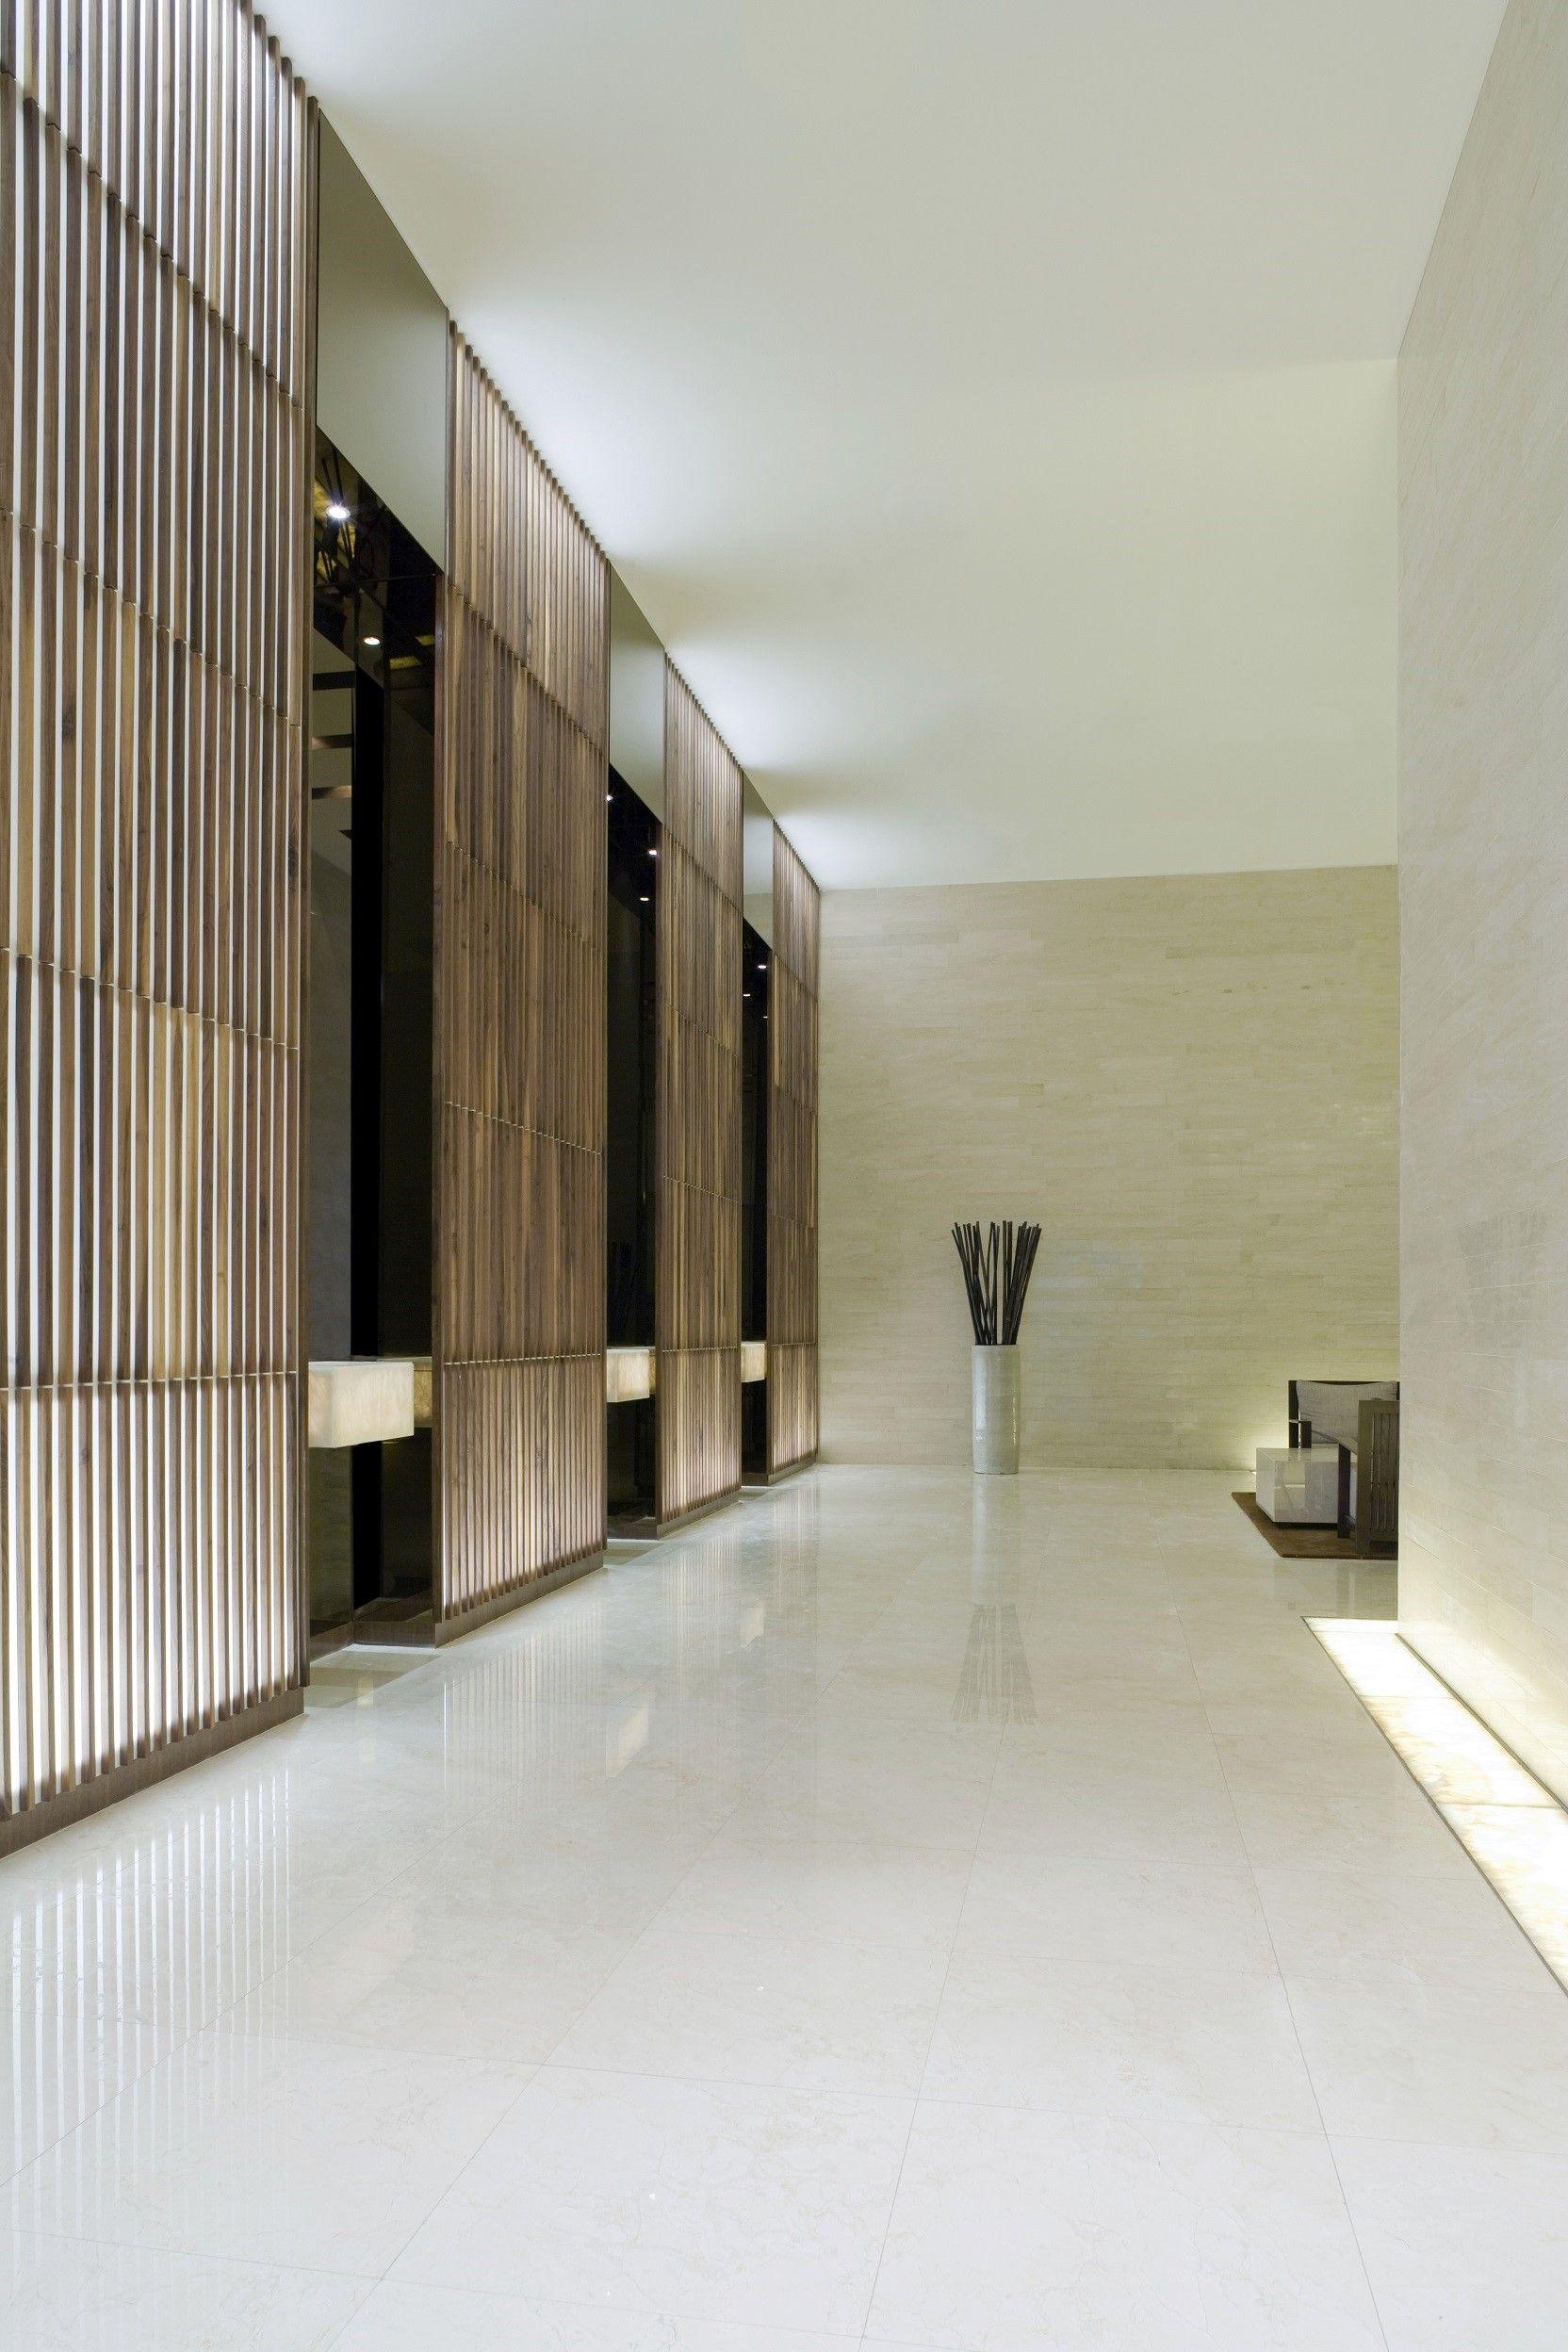 Modern spa designs 床, 廊下